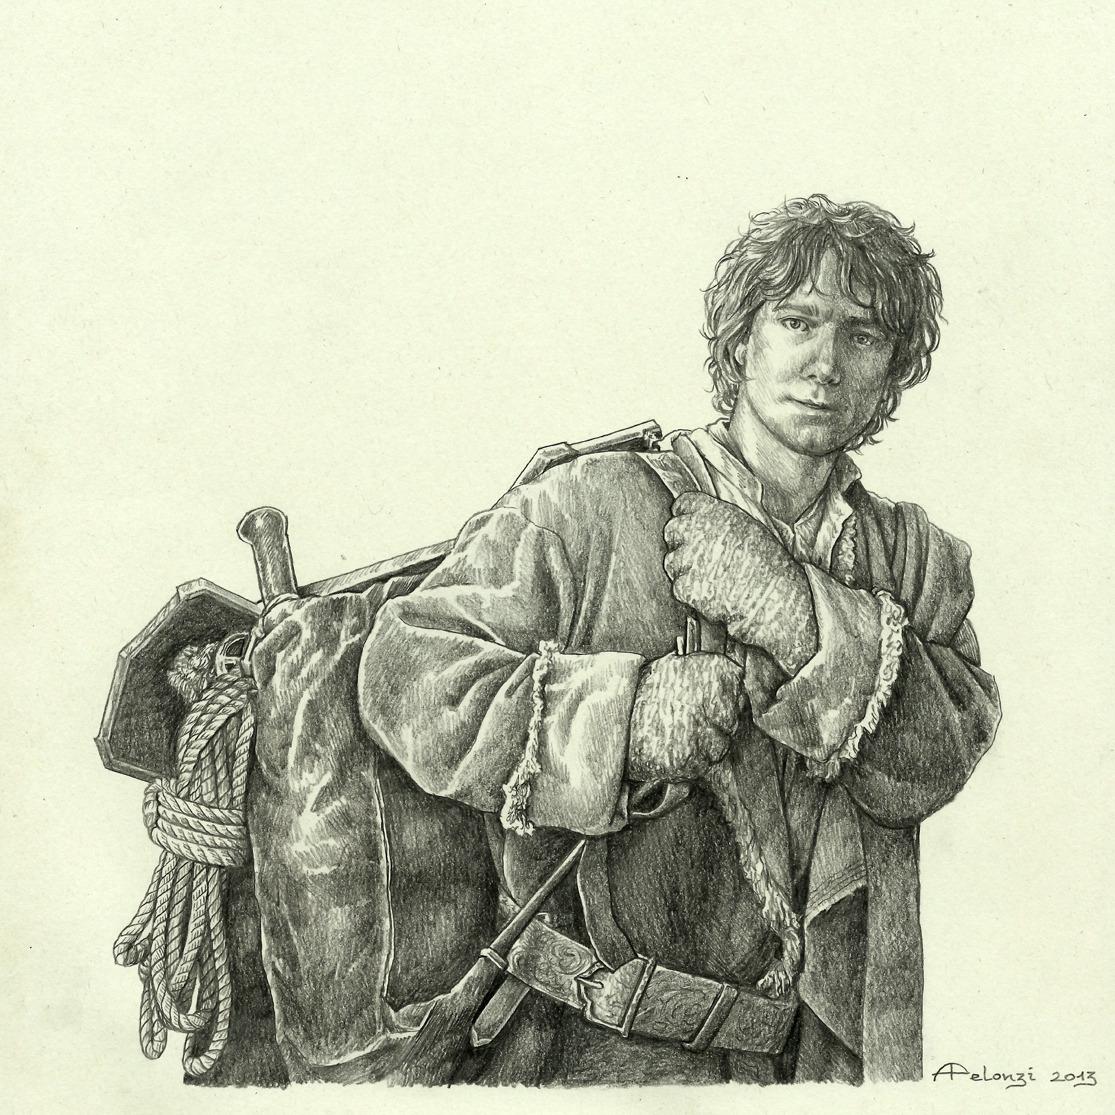 Dibujo de Bilbo Bolson por Alessia Pelonzi